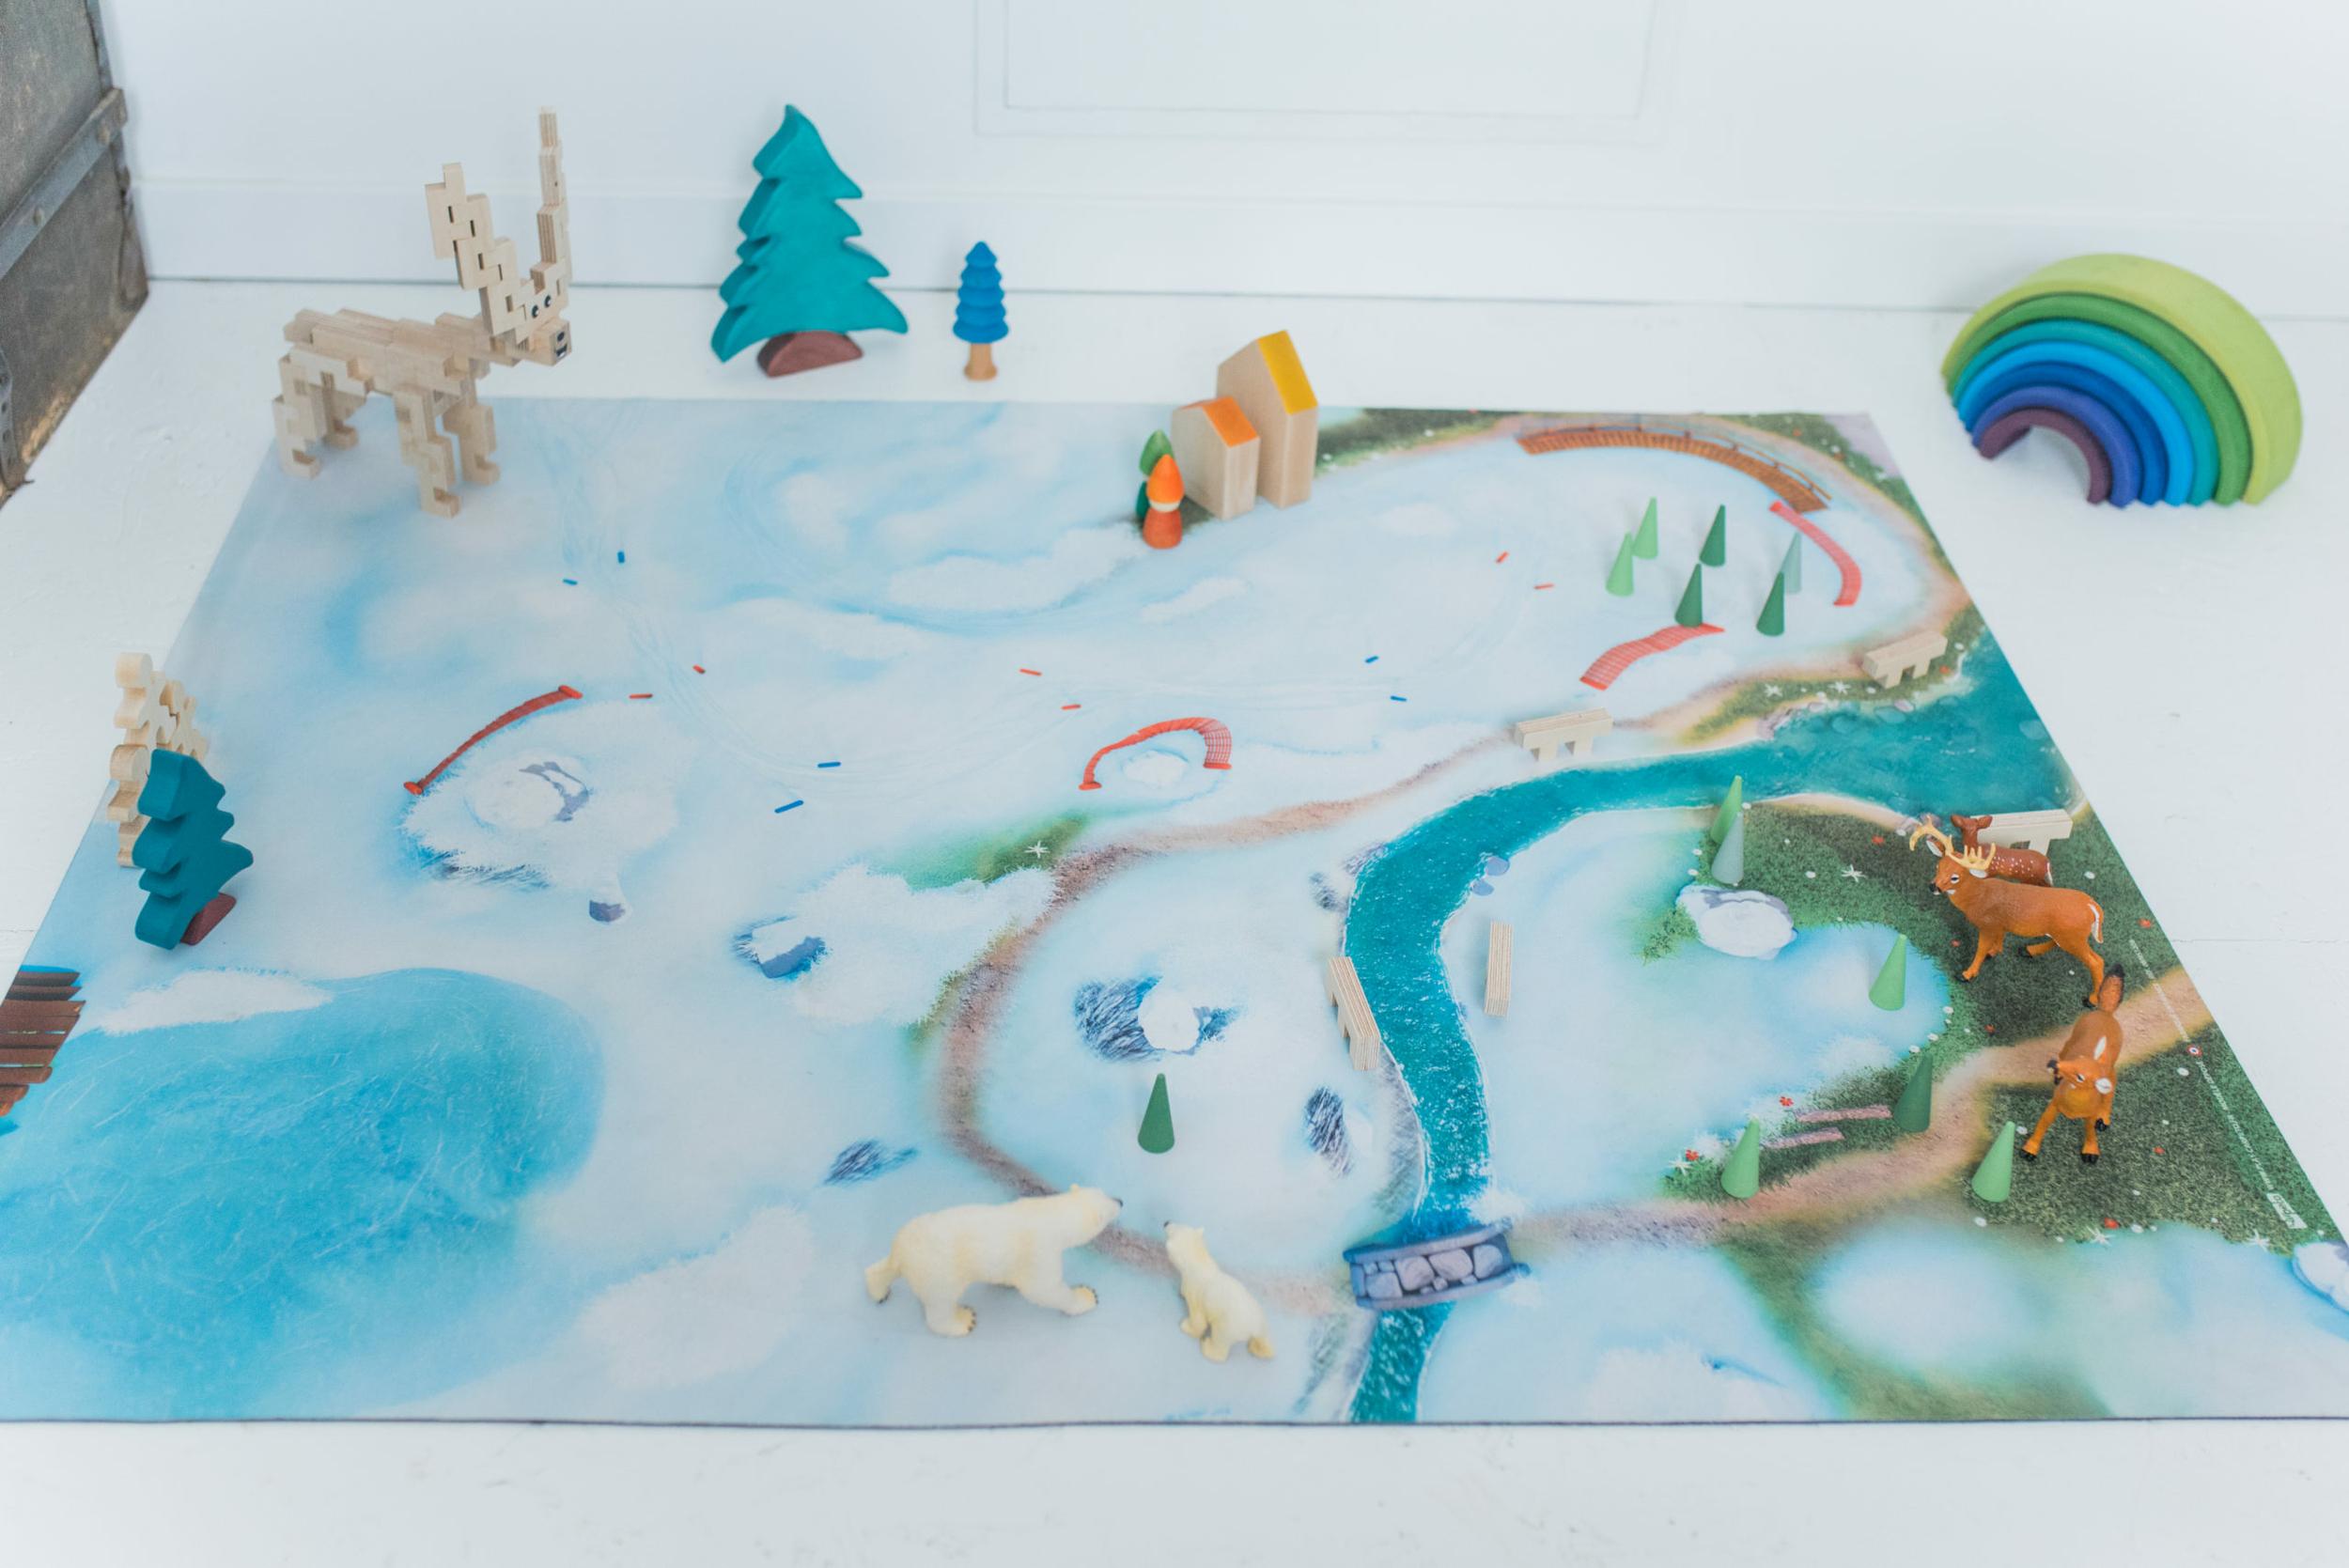 Klein Speelkleed Carpeto - Sneeuw Ster 90 x 60cm